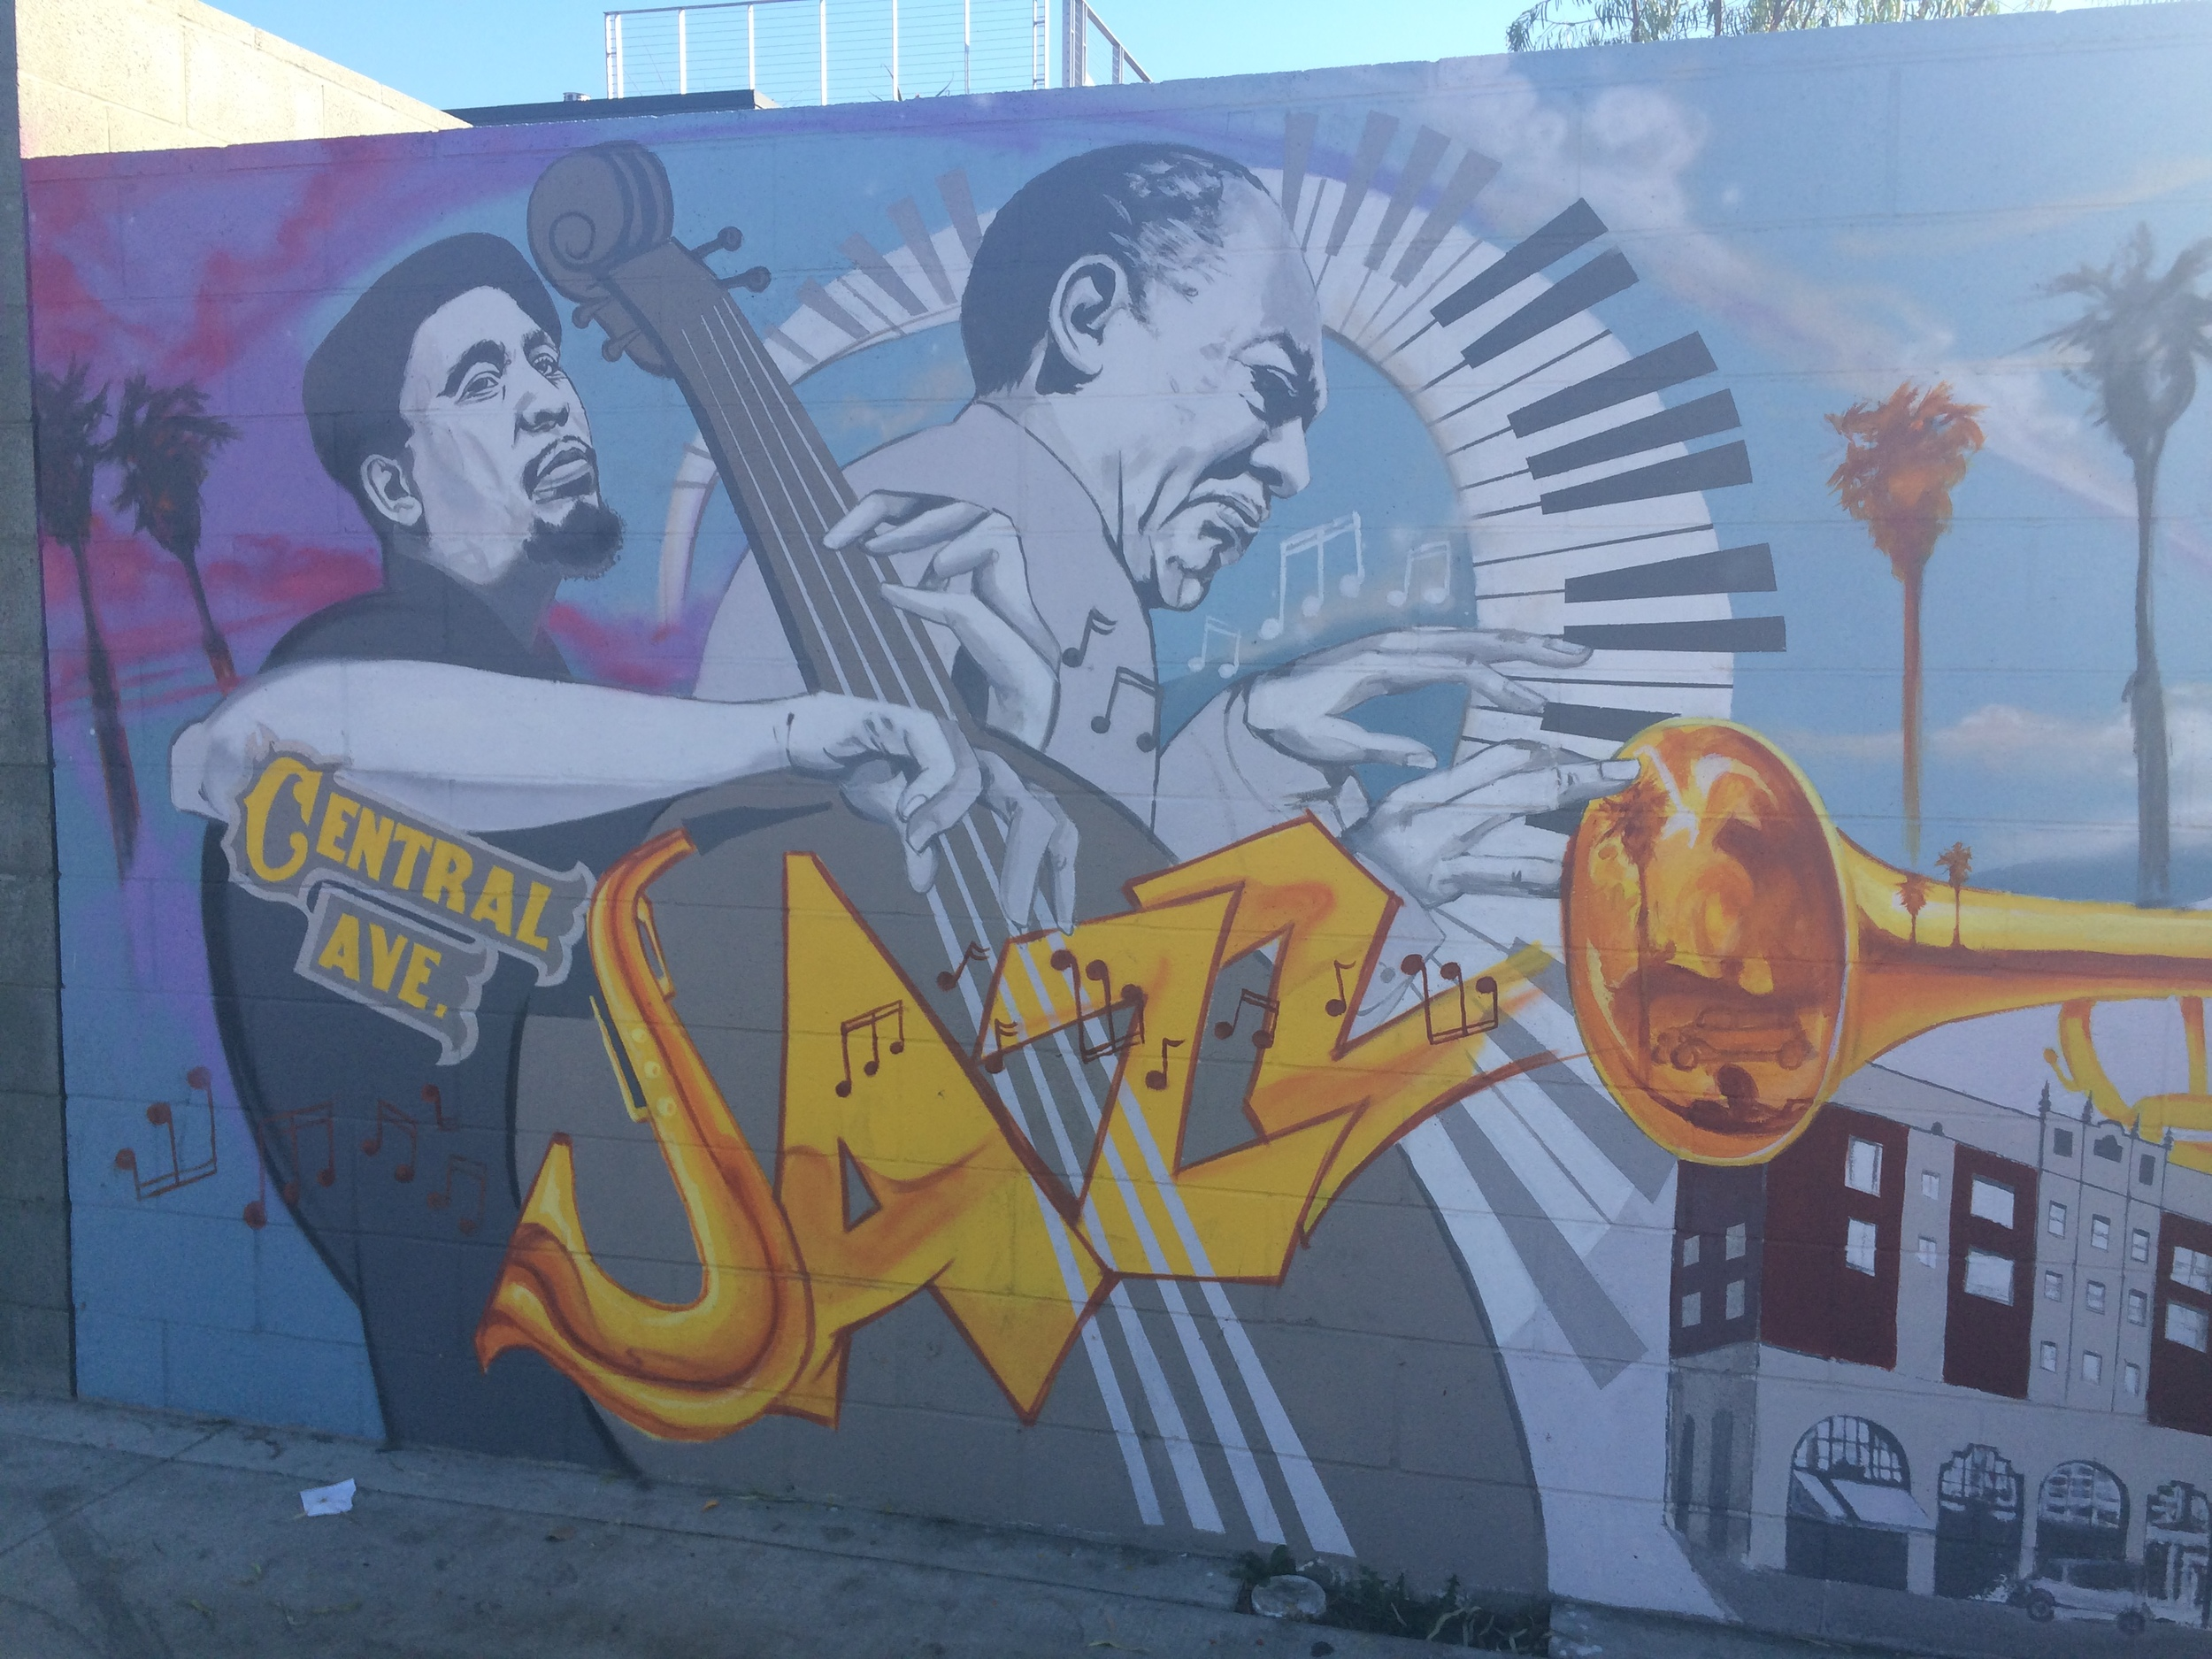 Central Avenue Jazz Festival 2014